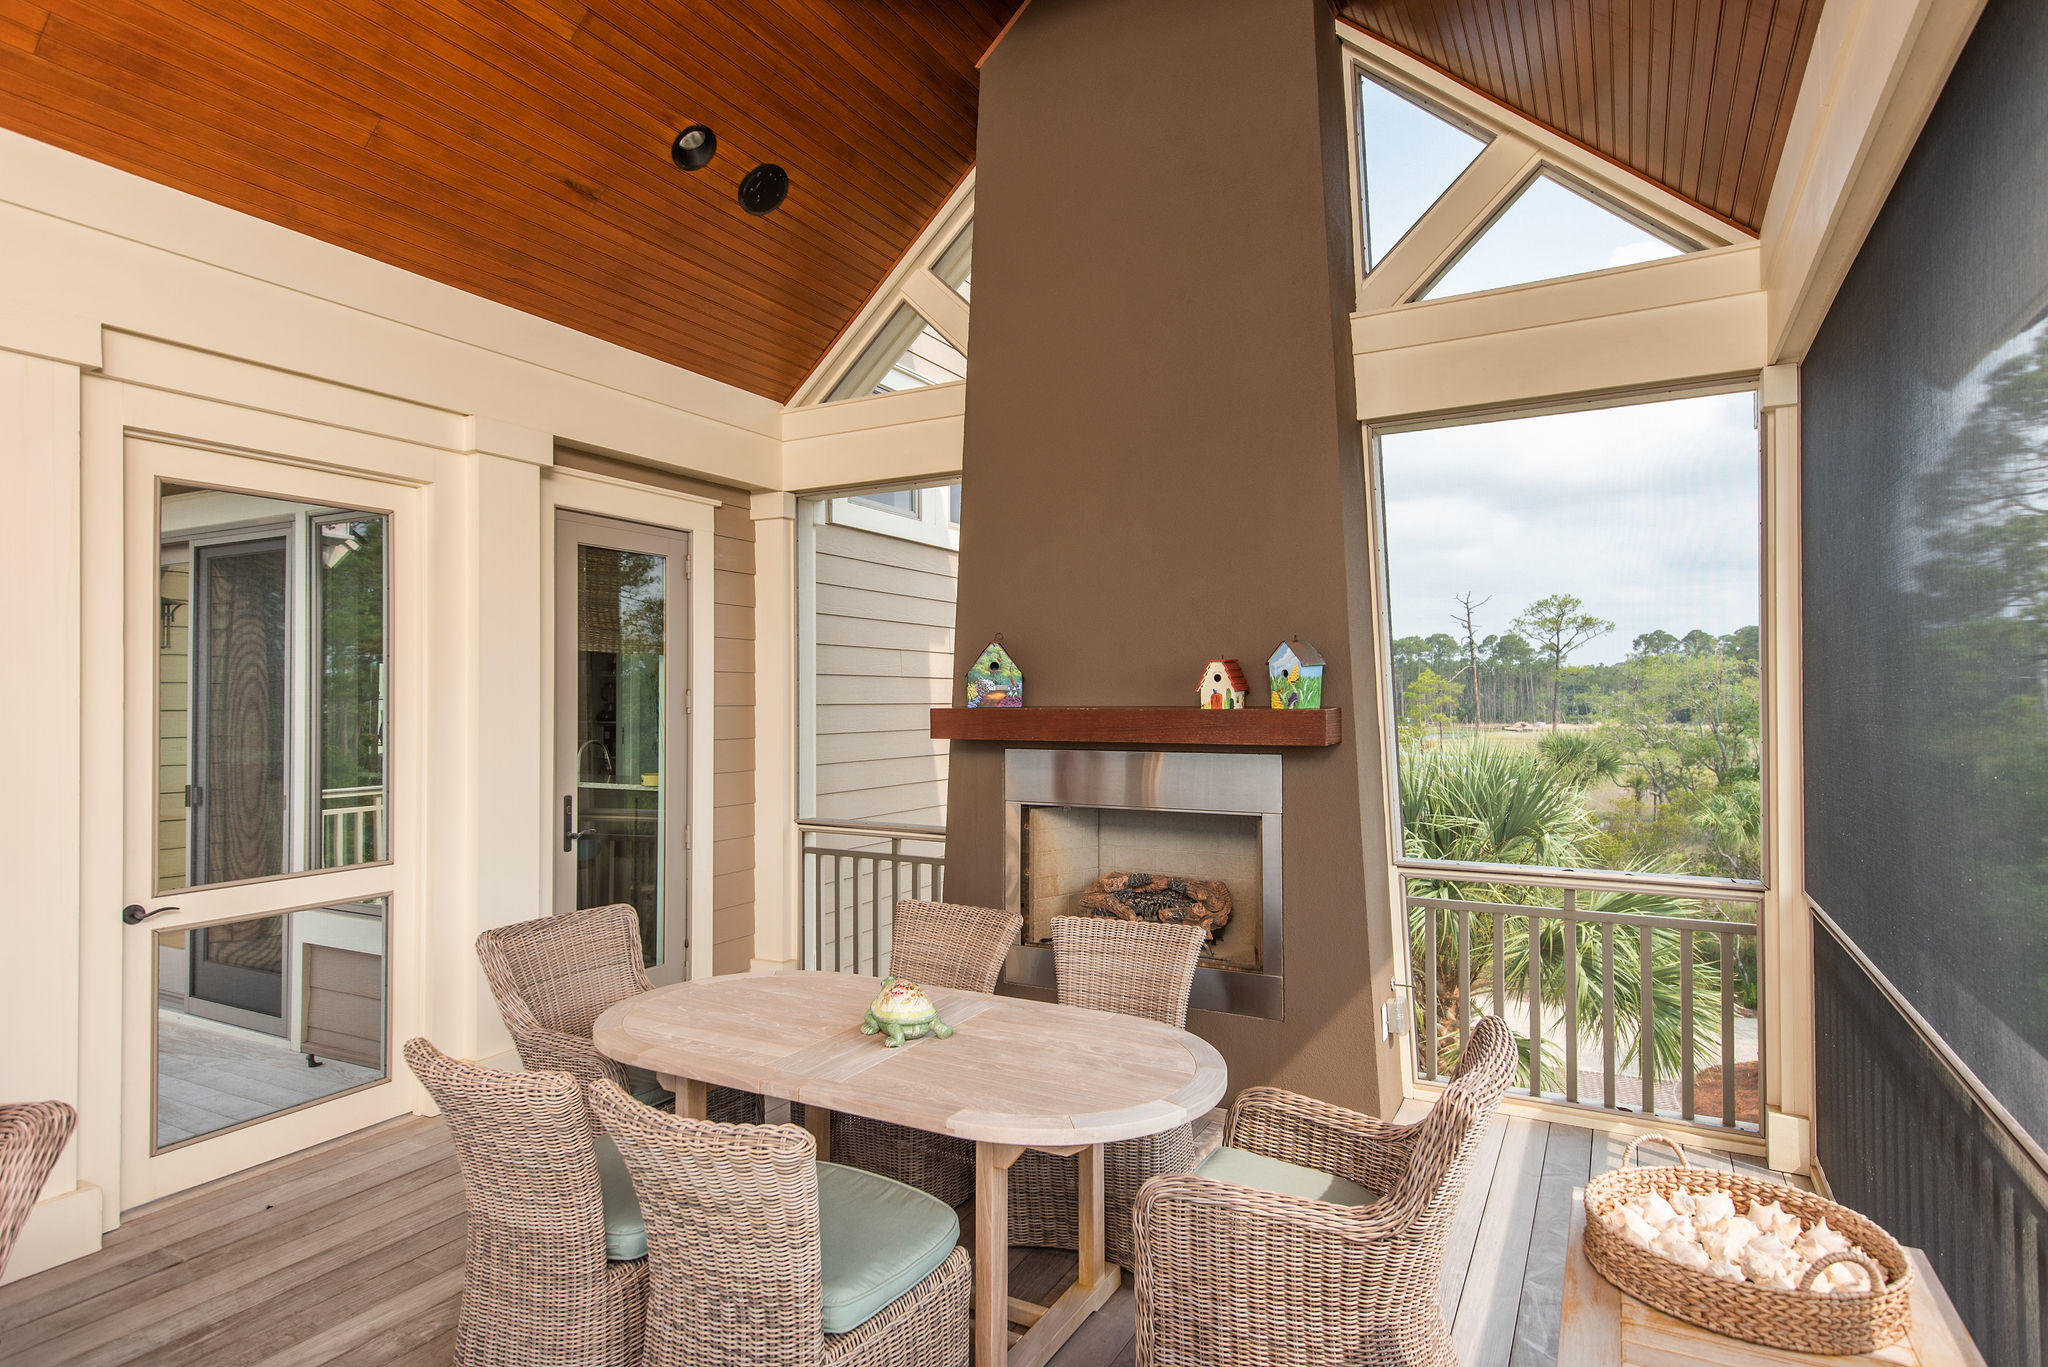 Seabrook Island Homes For Sale - 3135 Marshgate, Seabrook Island, SC - 43